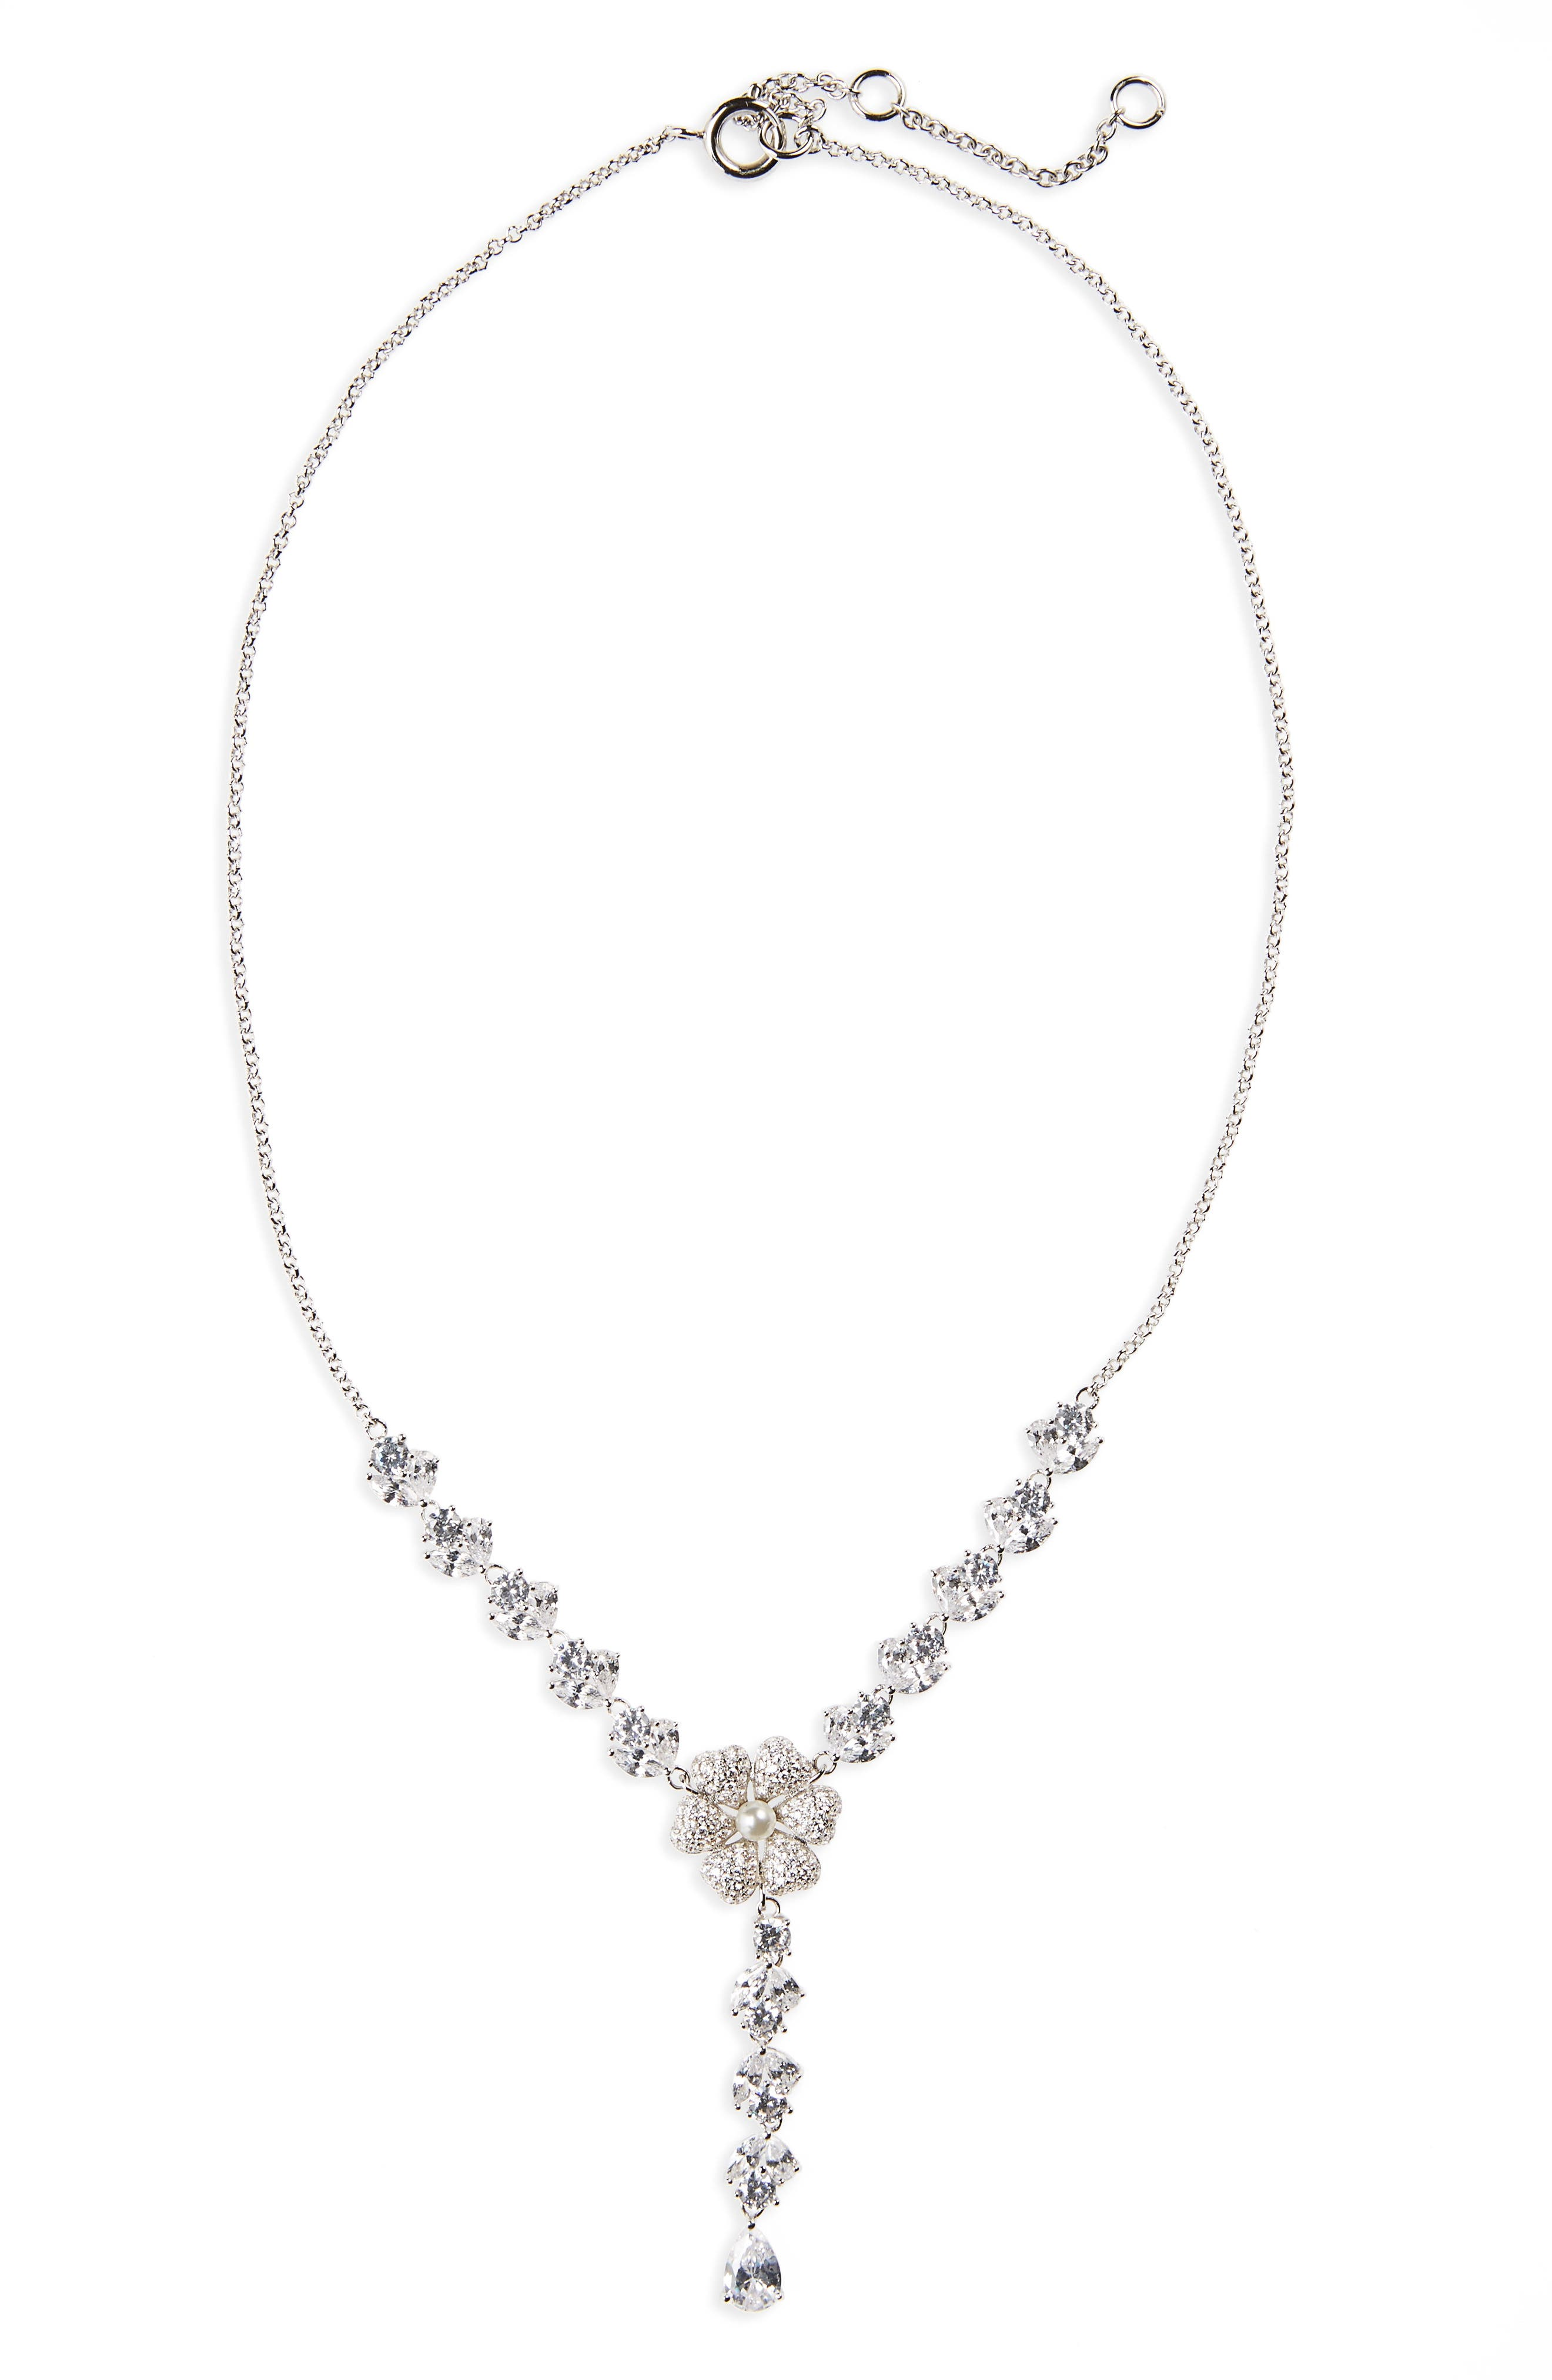 Main Image - Nina Swarovski Crystal & Imitation Pearl Flower Y-Necklace